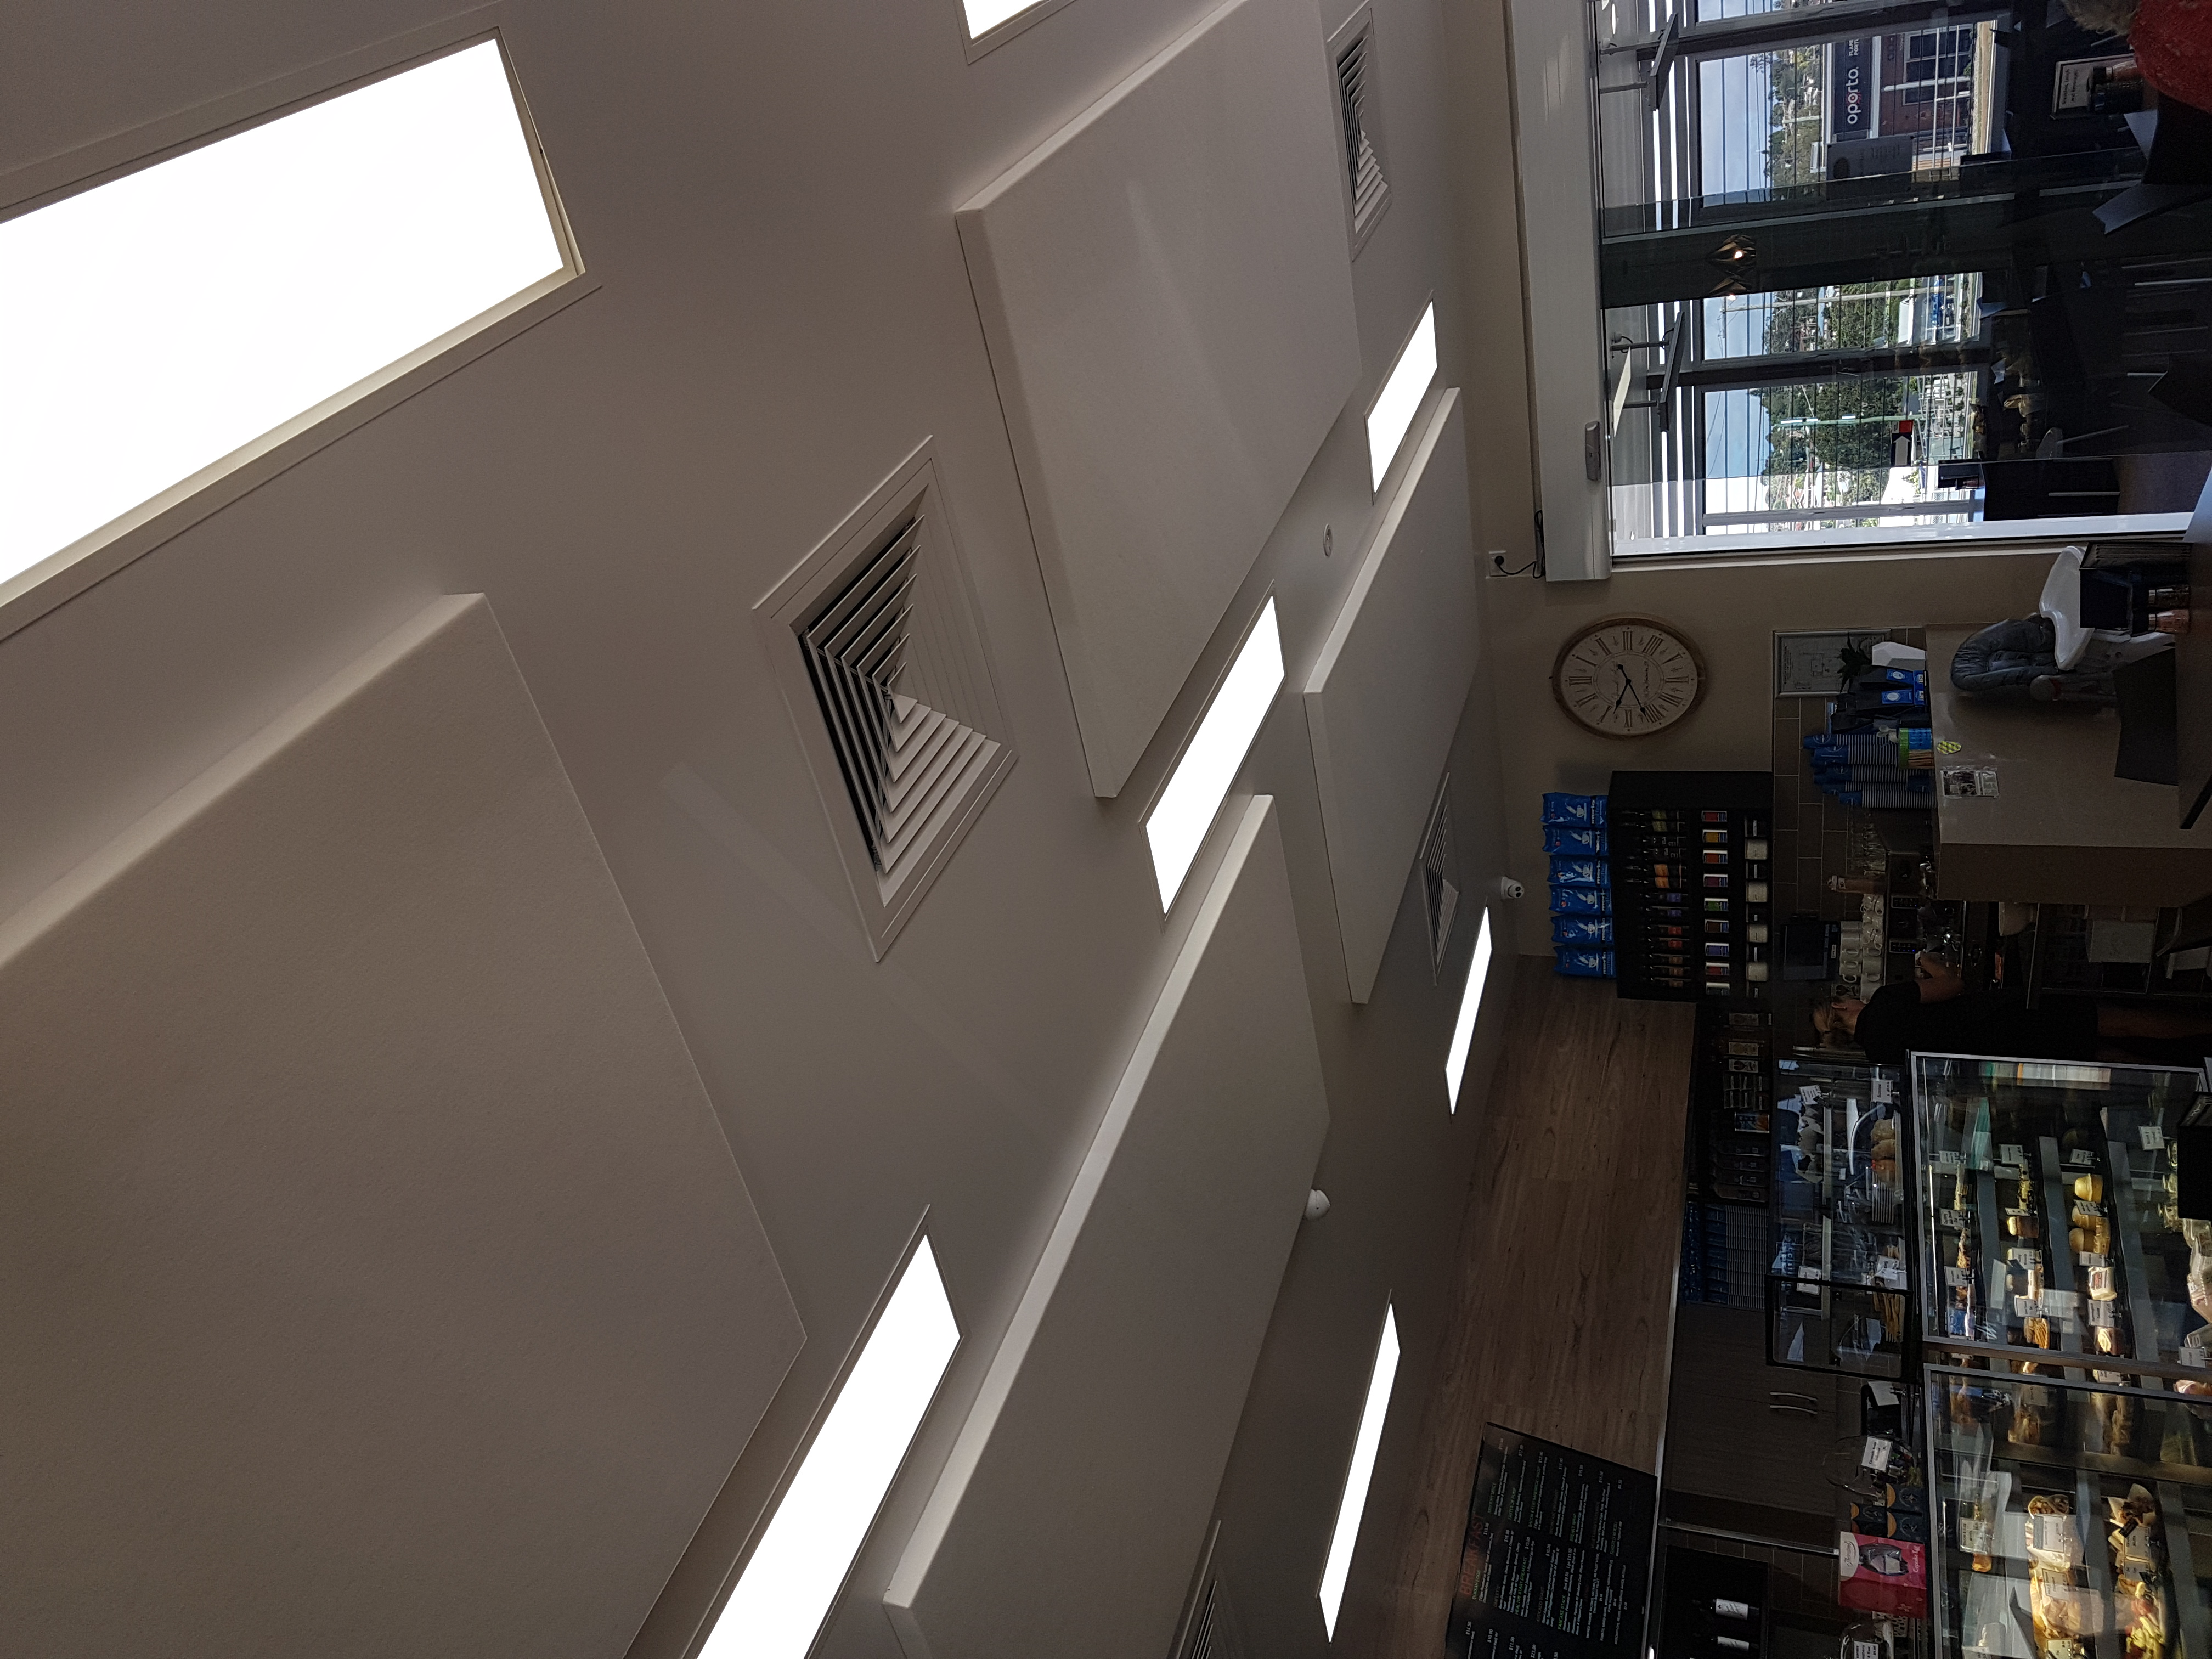 Ceiling Noise Control Treatment - Pump Coffee